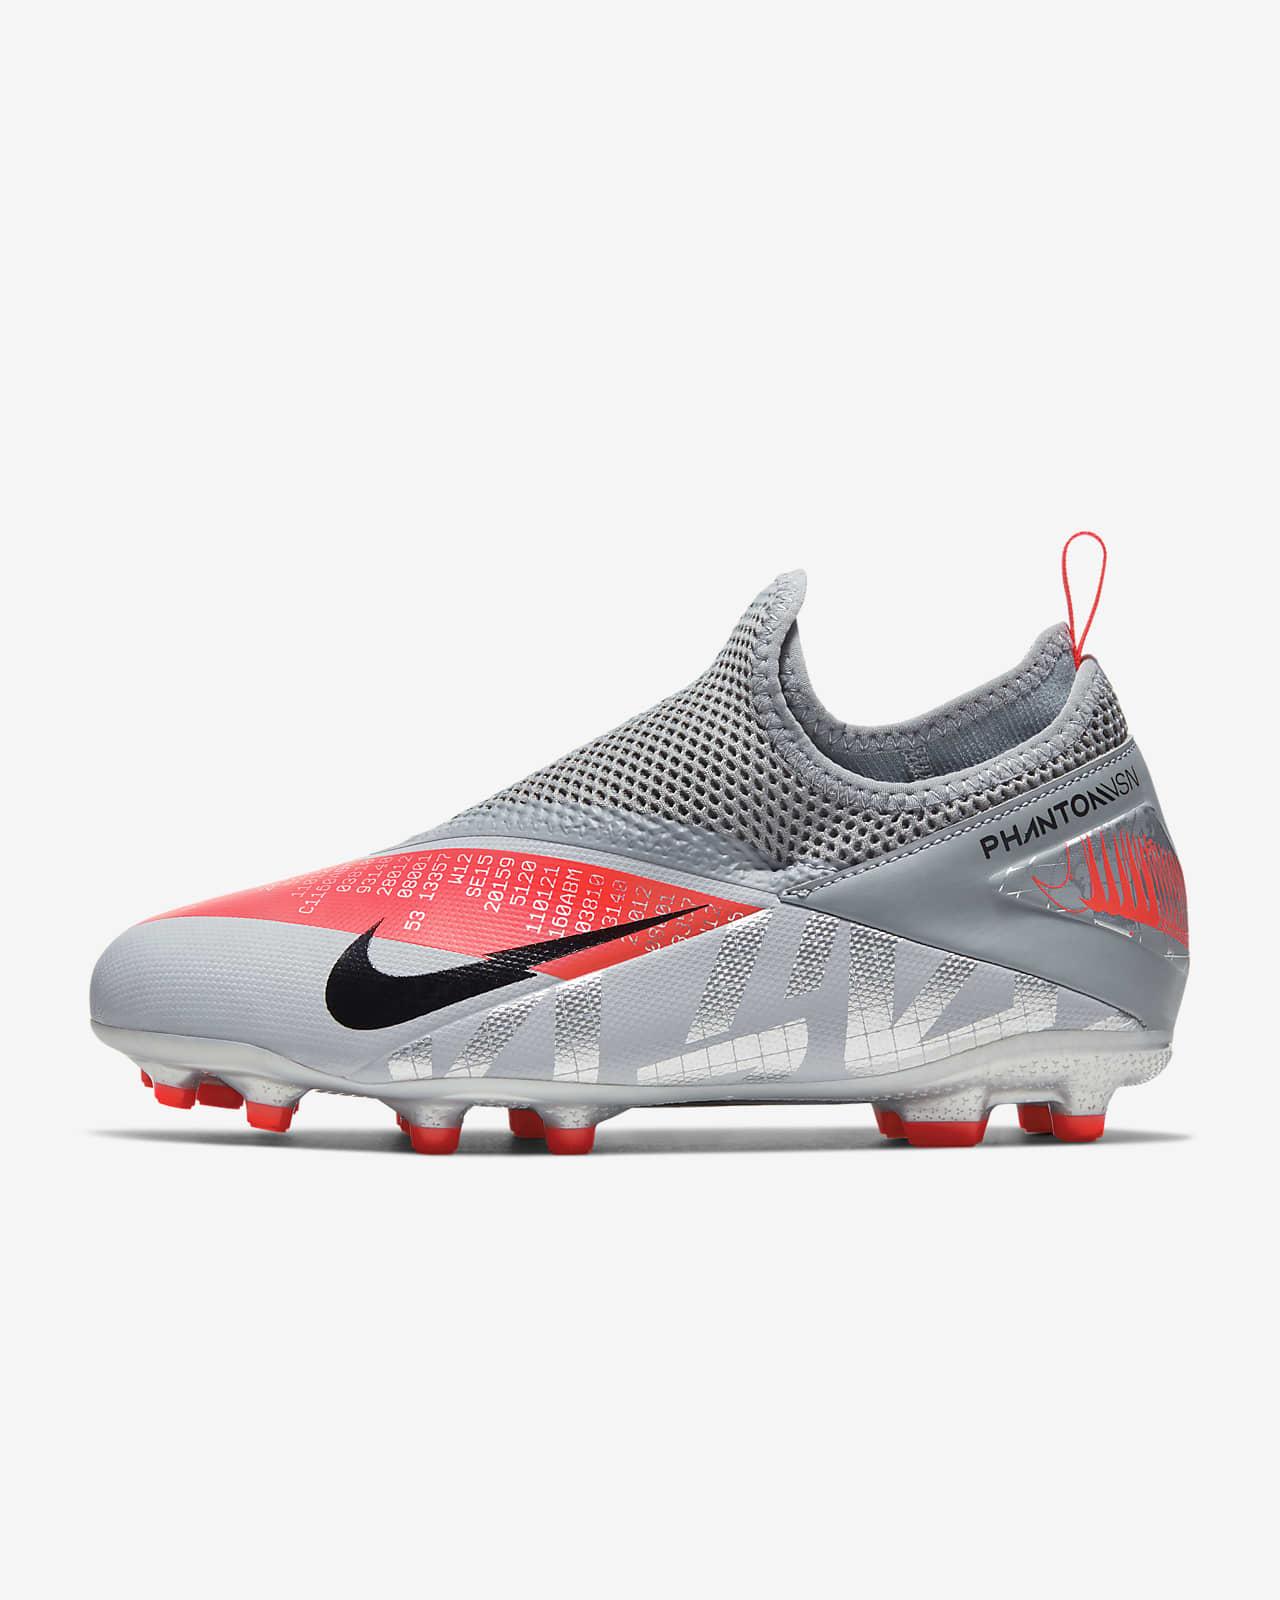 Tubería resbalón Contrapartida  Nike Jr. Phantom Vision 2 Academy Dynamic Fit MG Younger/Older Kids'  Multi-Ground Football Boot. Nike SA